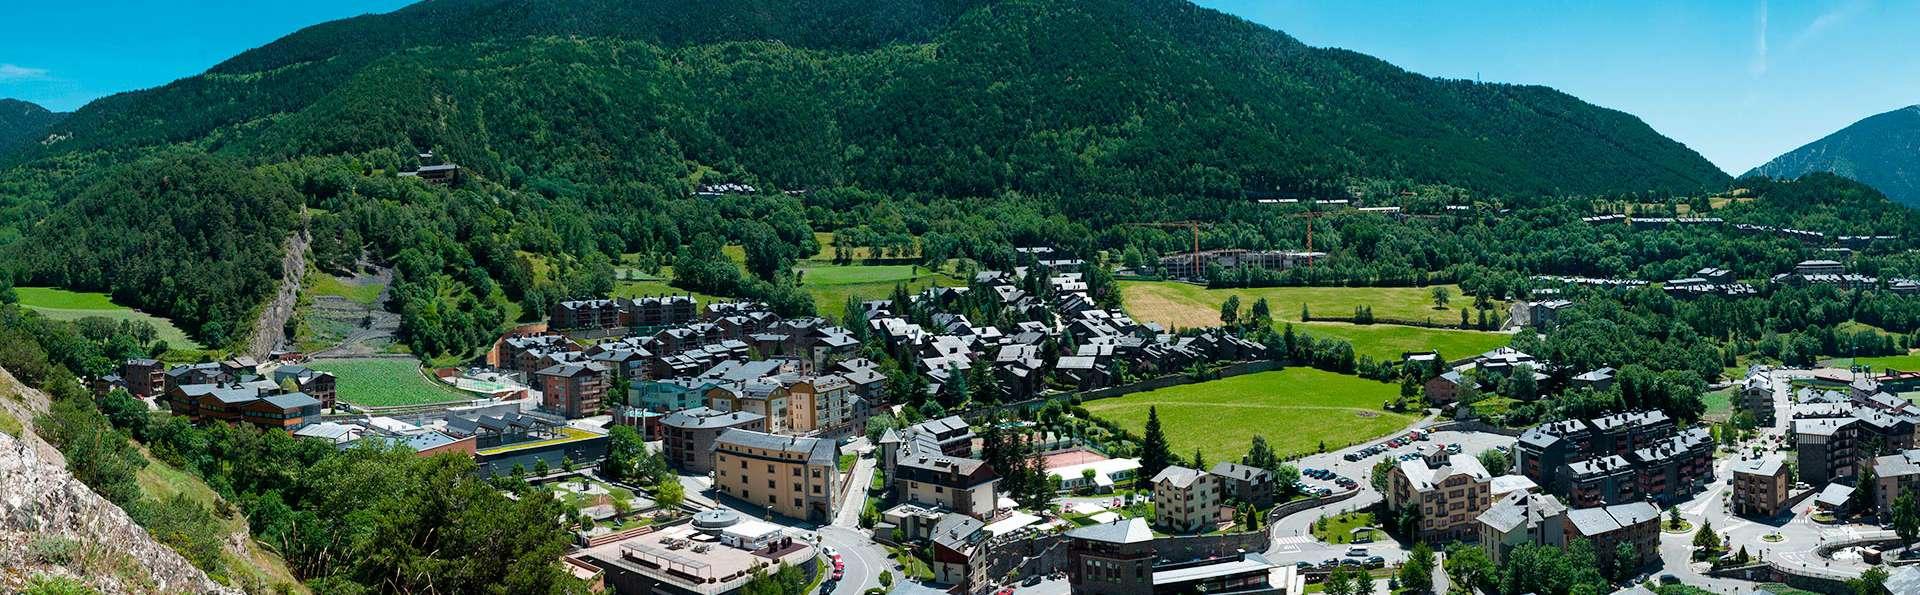 Ontspanning met toegang tot spa in de Pyreneeën van Andorra